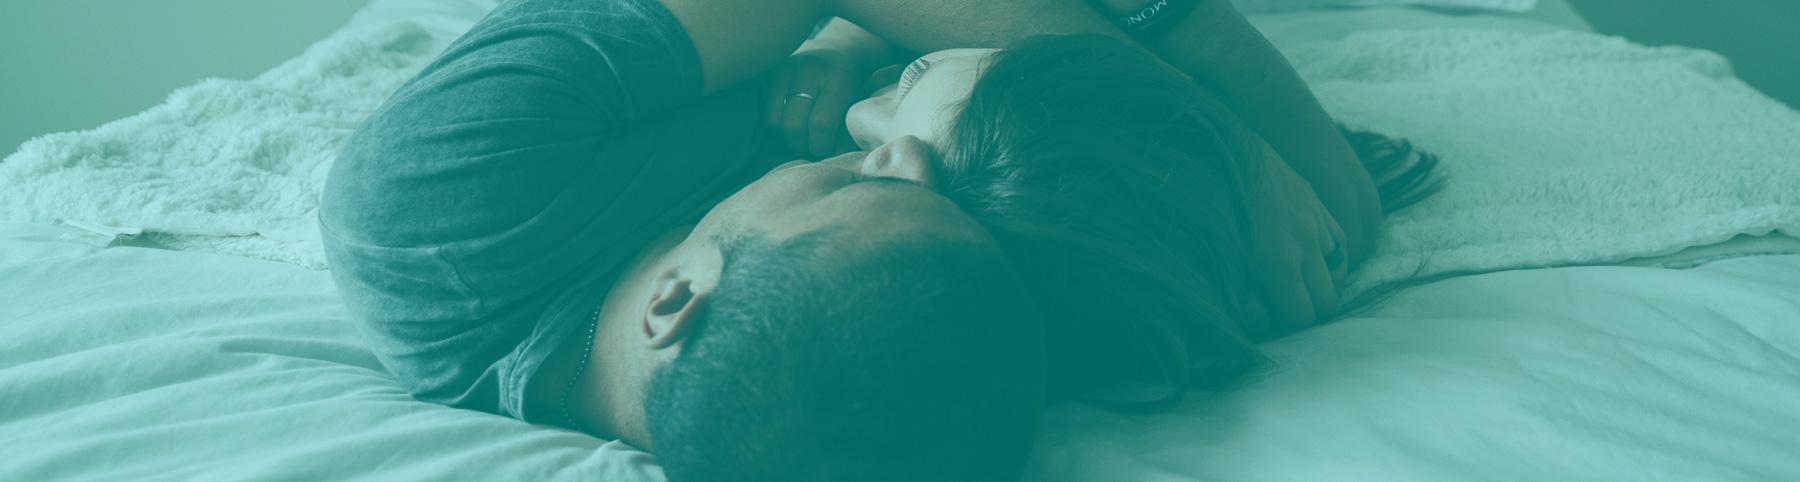 Helping Patients Control Compulsive Sexual Behavior -